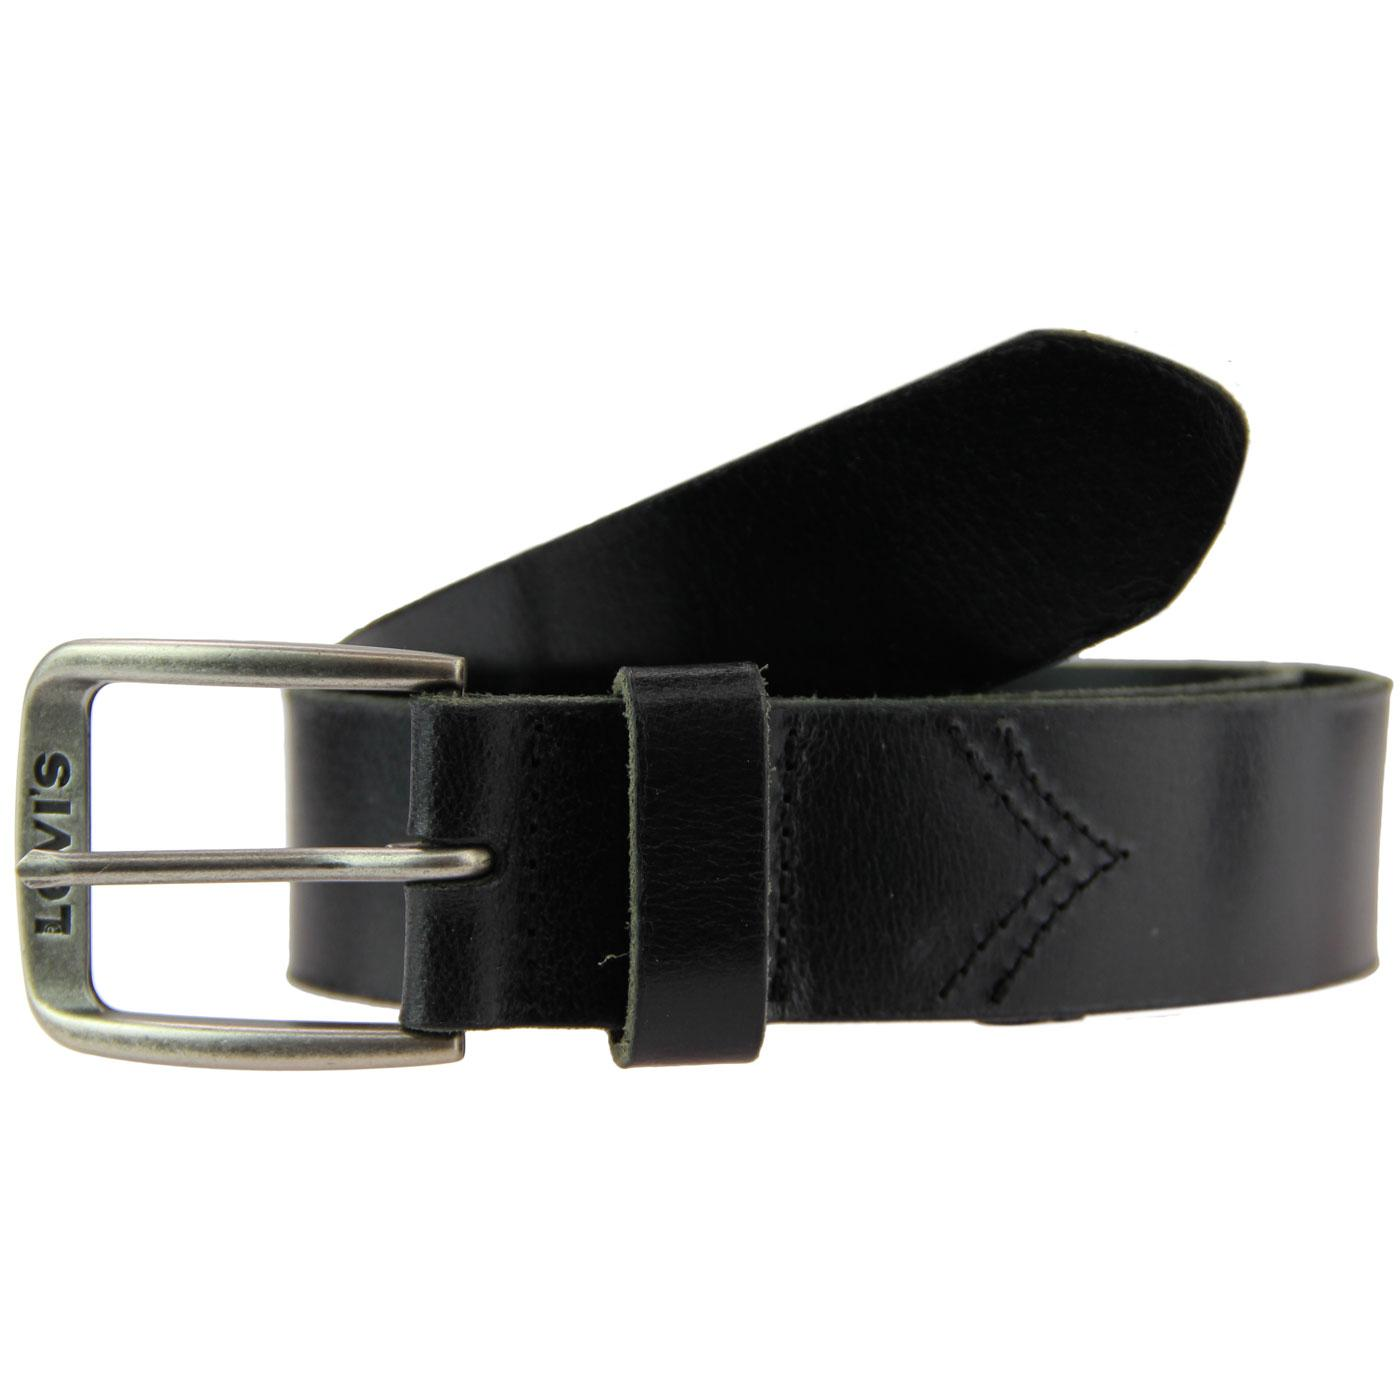 Alturas LEVI'S Retro Chevron Stitch Belt (Black)